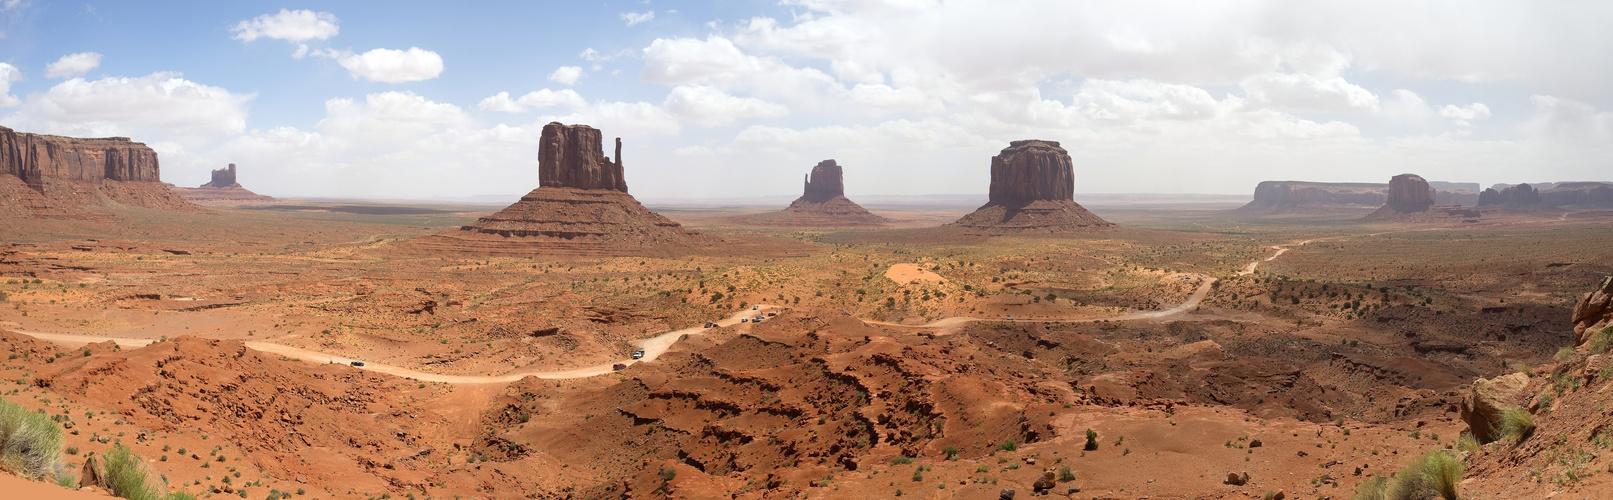 Panorama vom Monument Valley